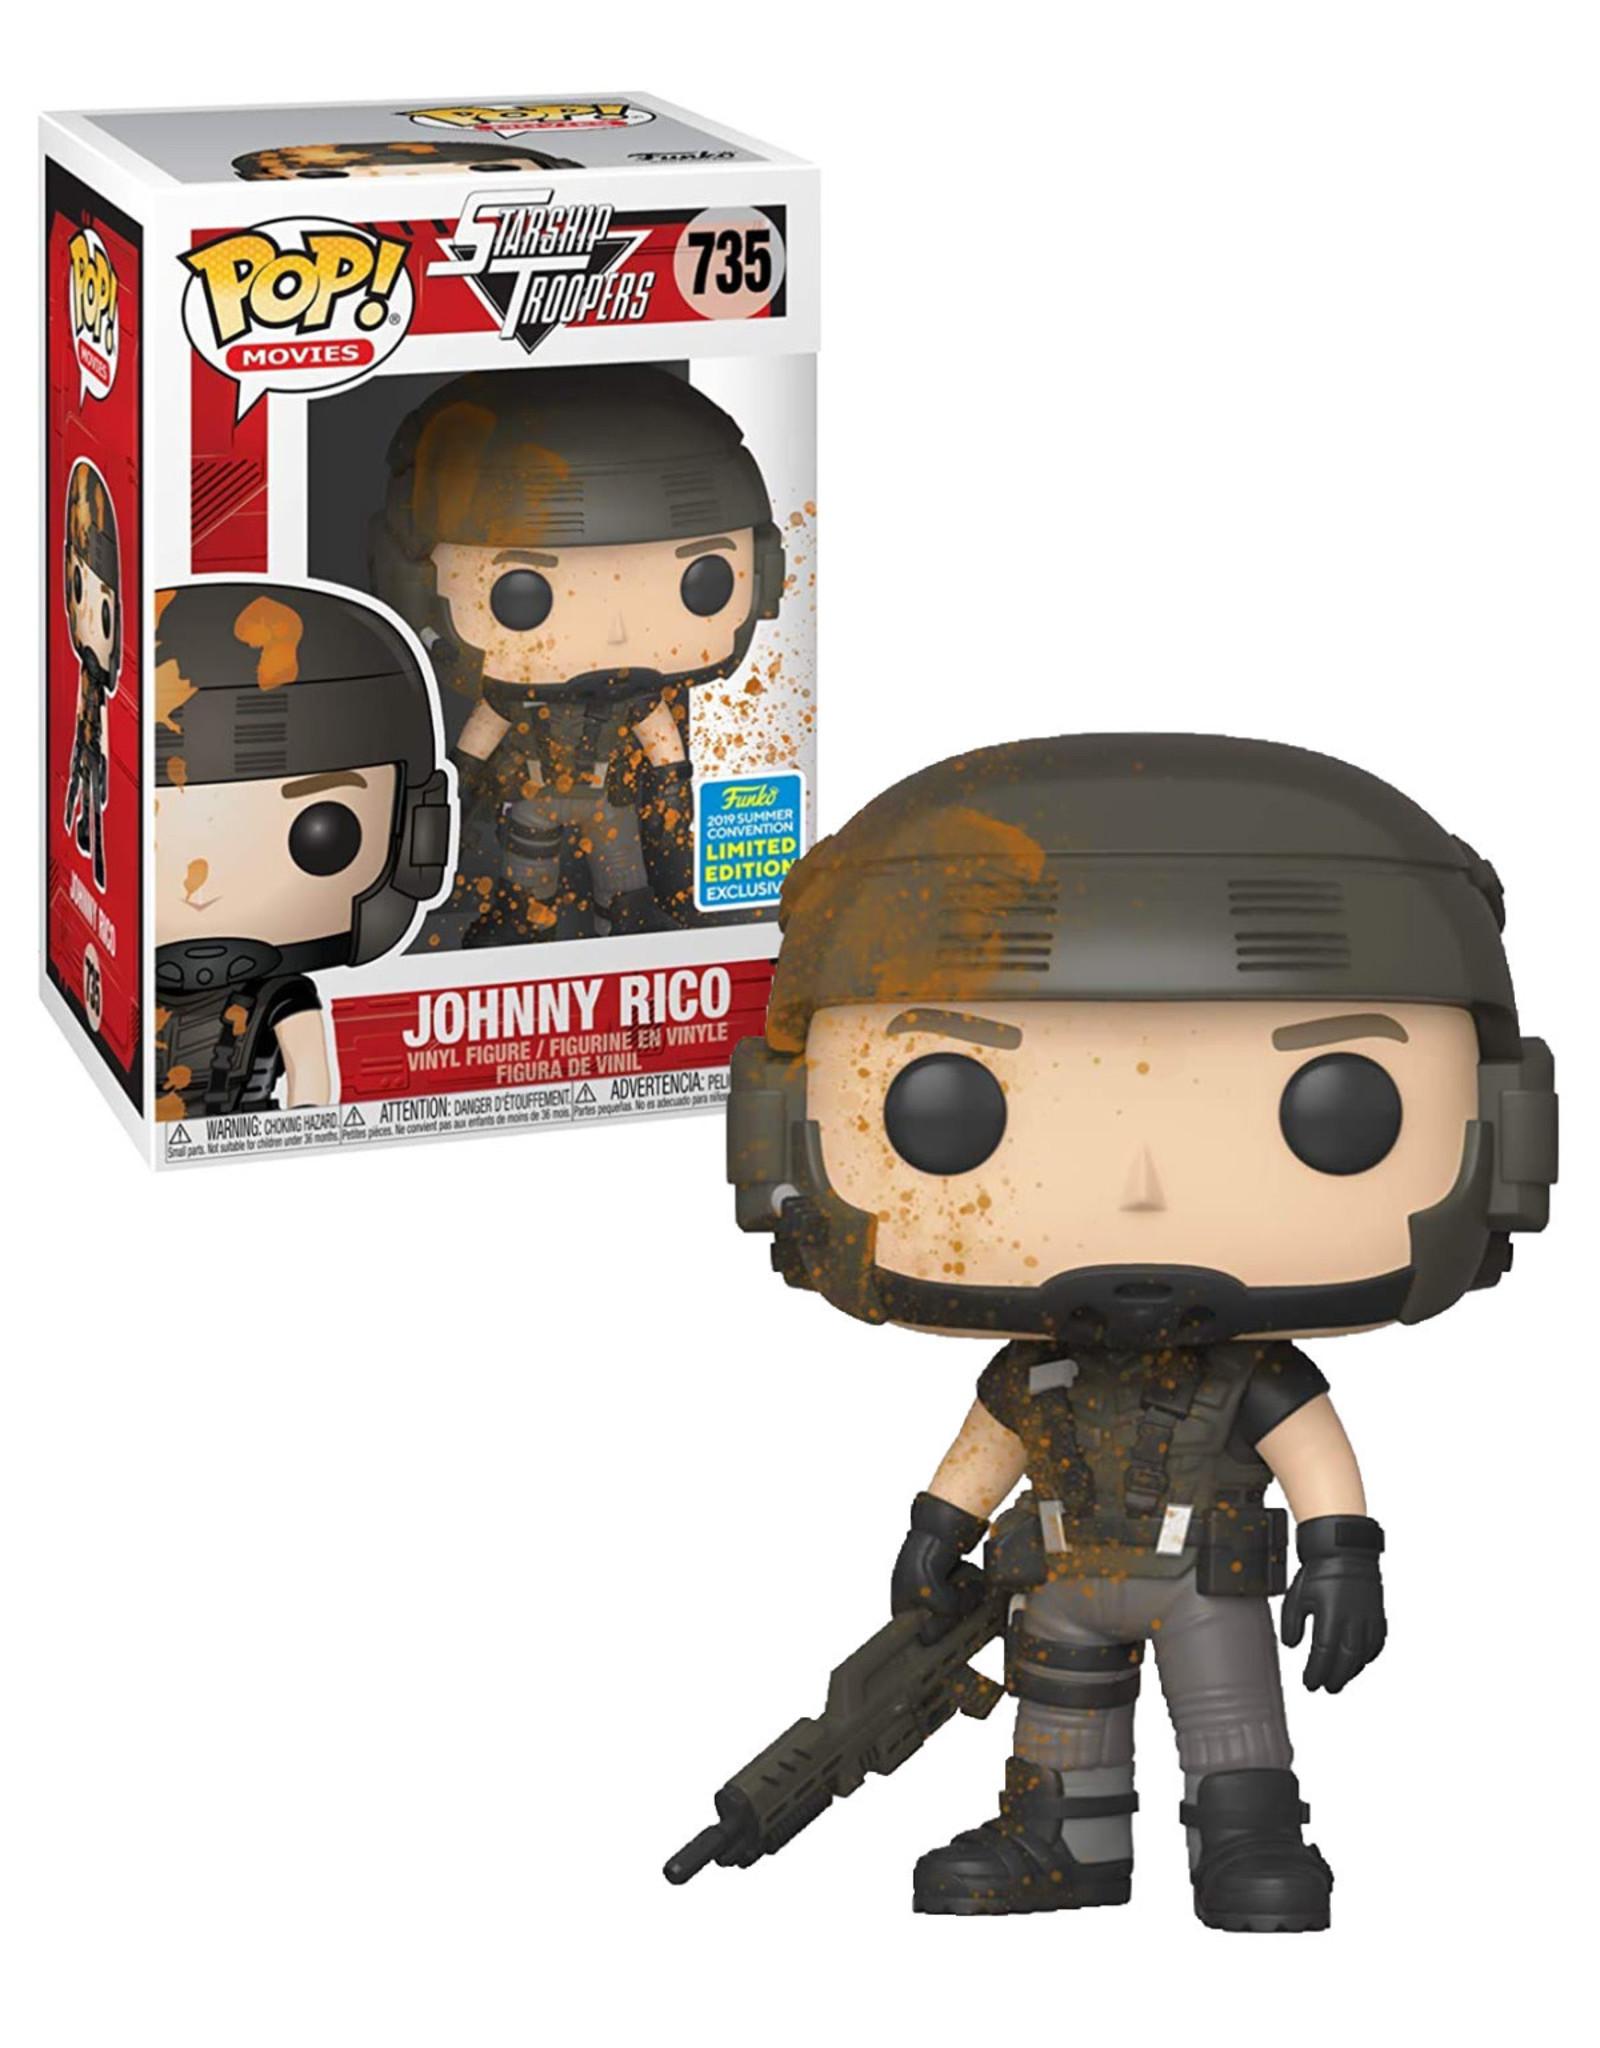 Starship Troopers 735 ( Funko Pop ) Johnny Rico